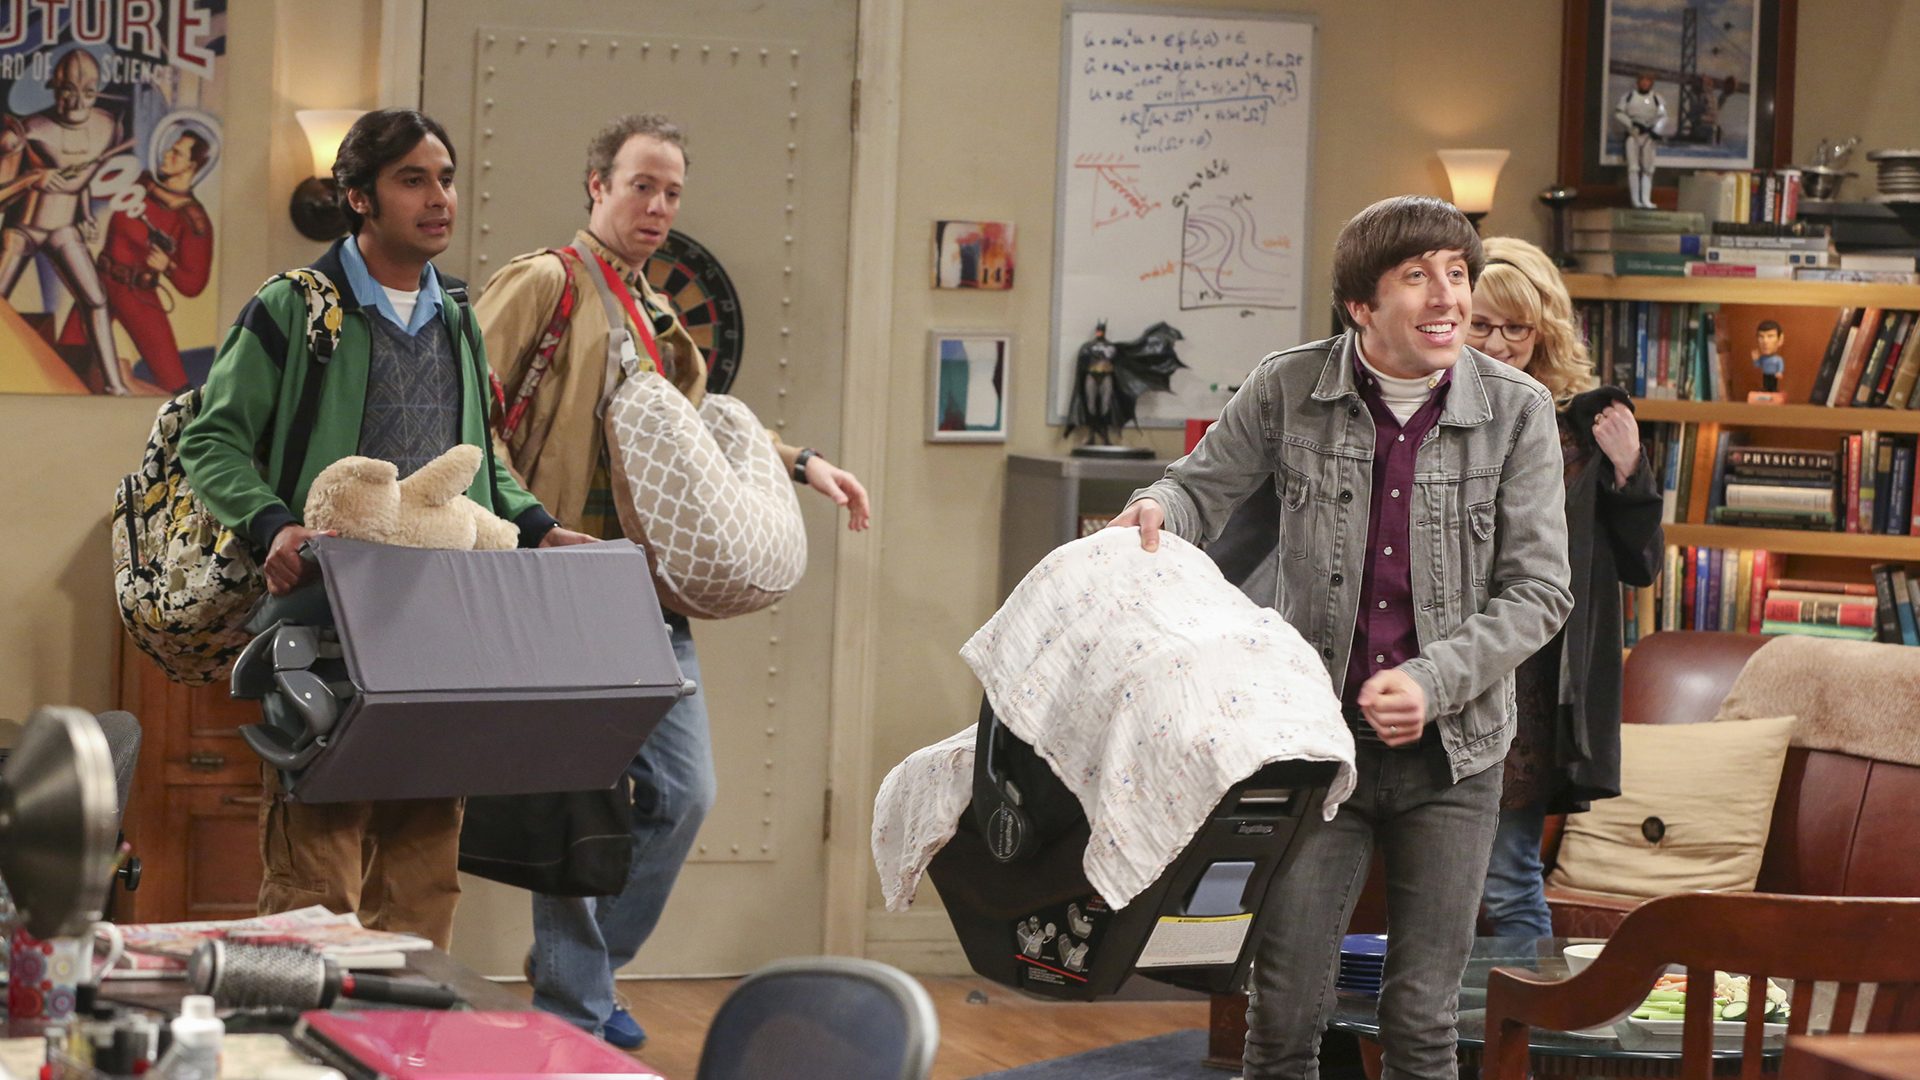 Raj, Stuart, Howard, and Bernadette arrive with baby Halley.